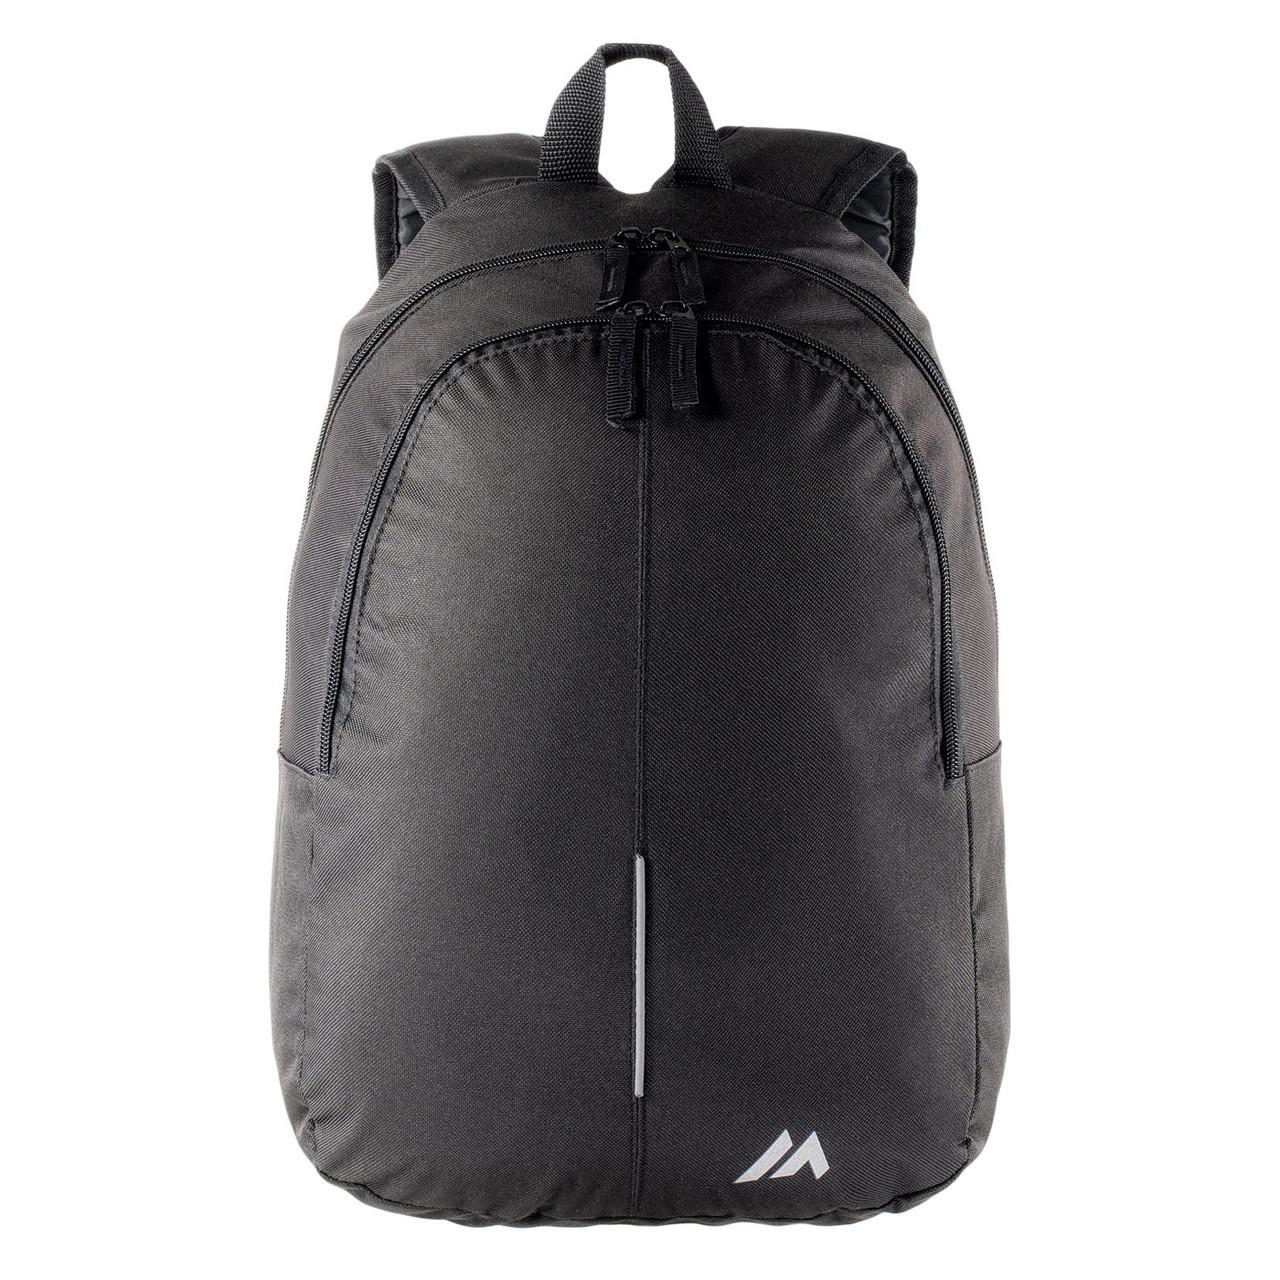 Рюкзак Martes Spruce 24L Black